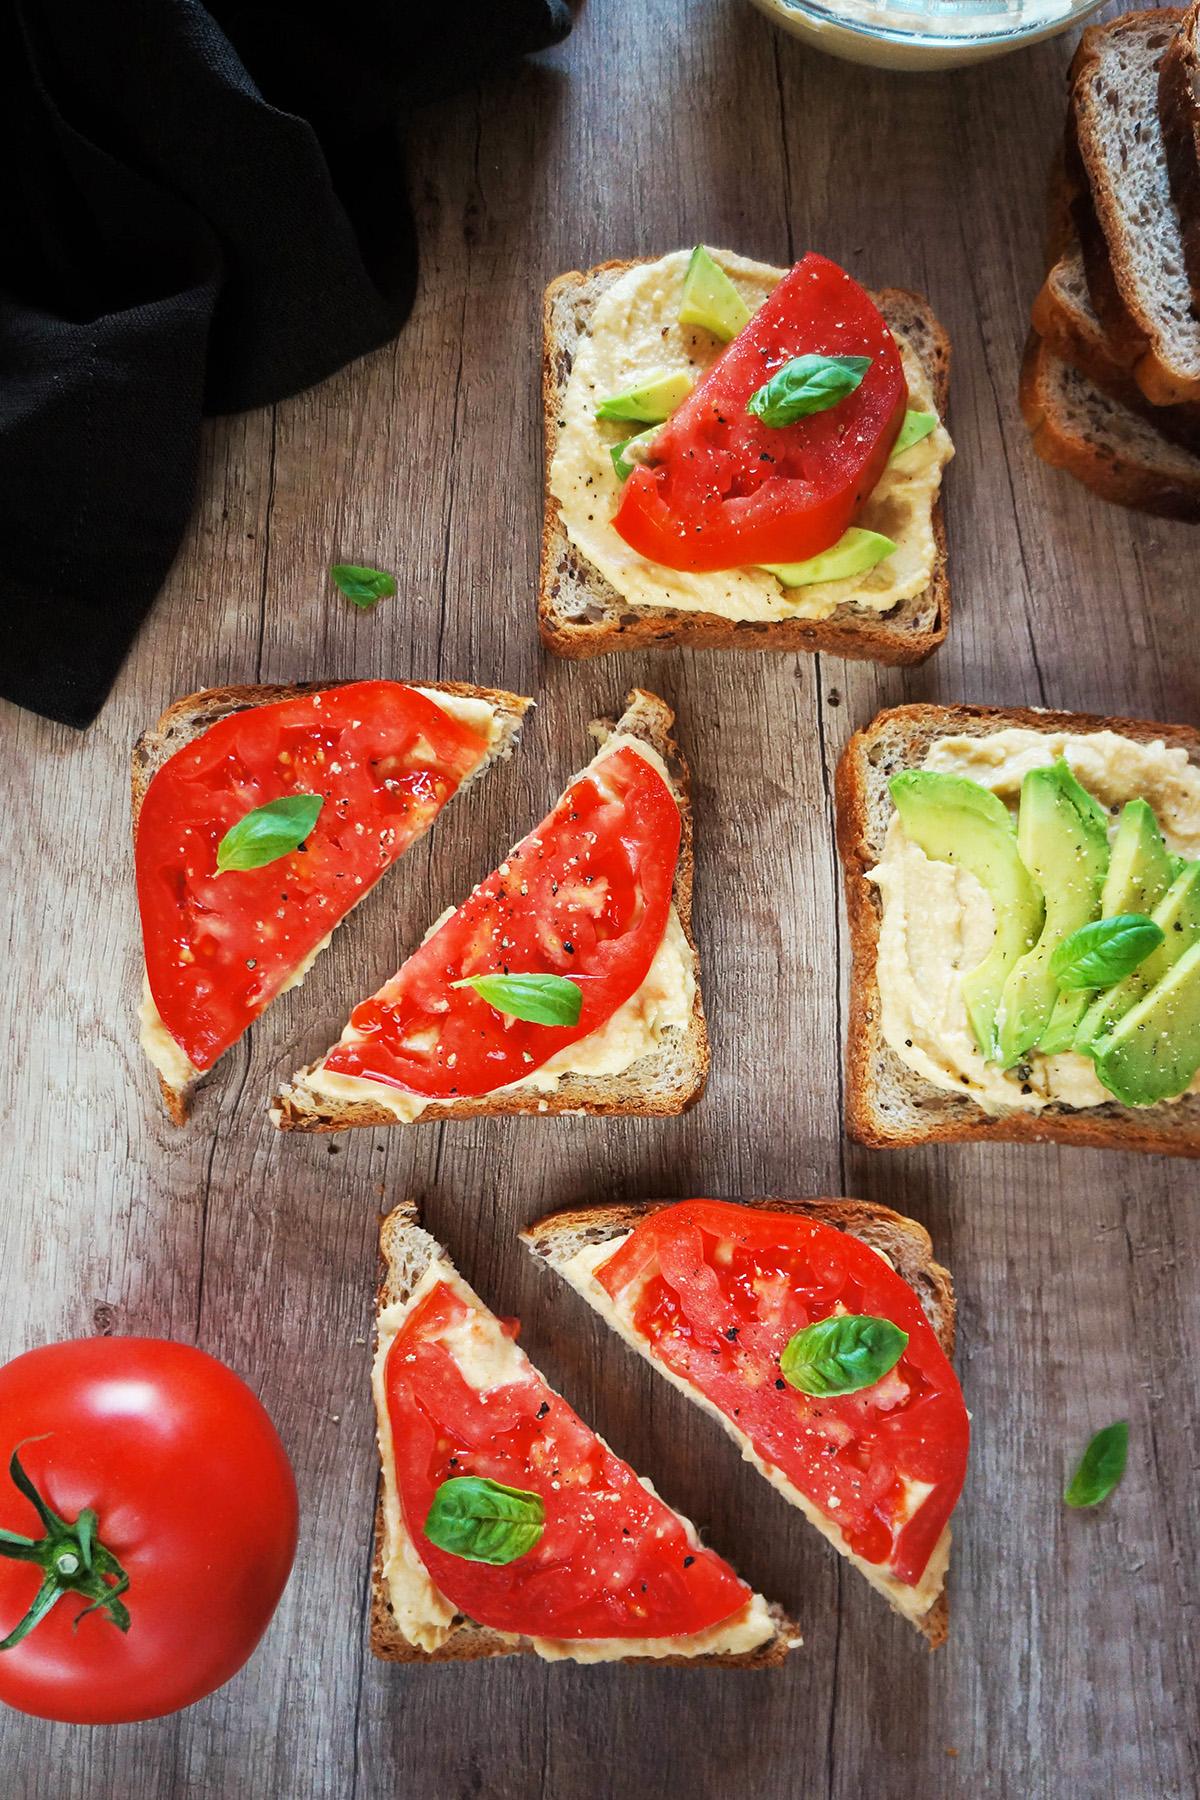 Sendvič s humusom, paradižnikom in avokadom